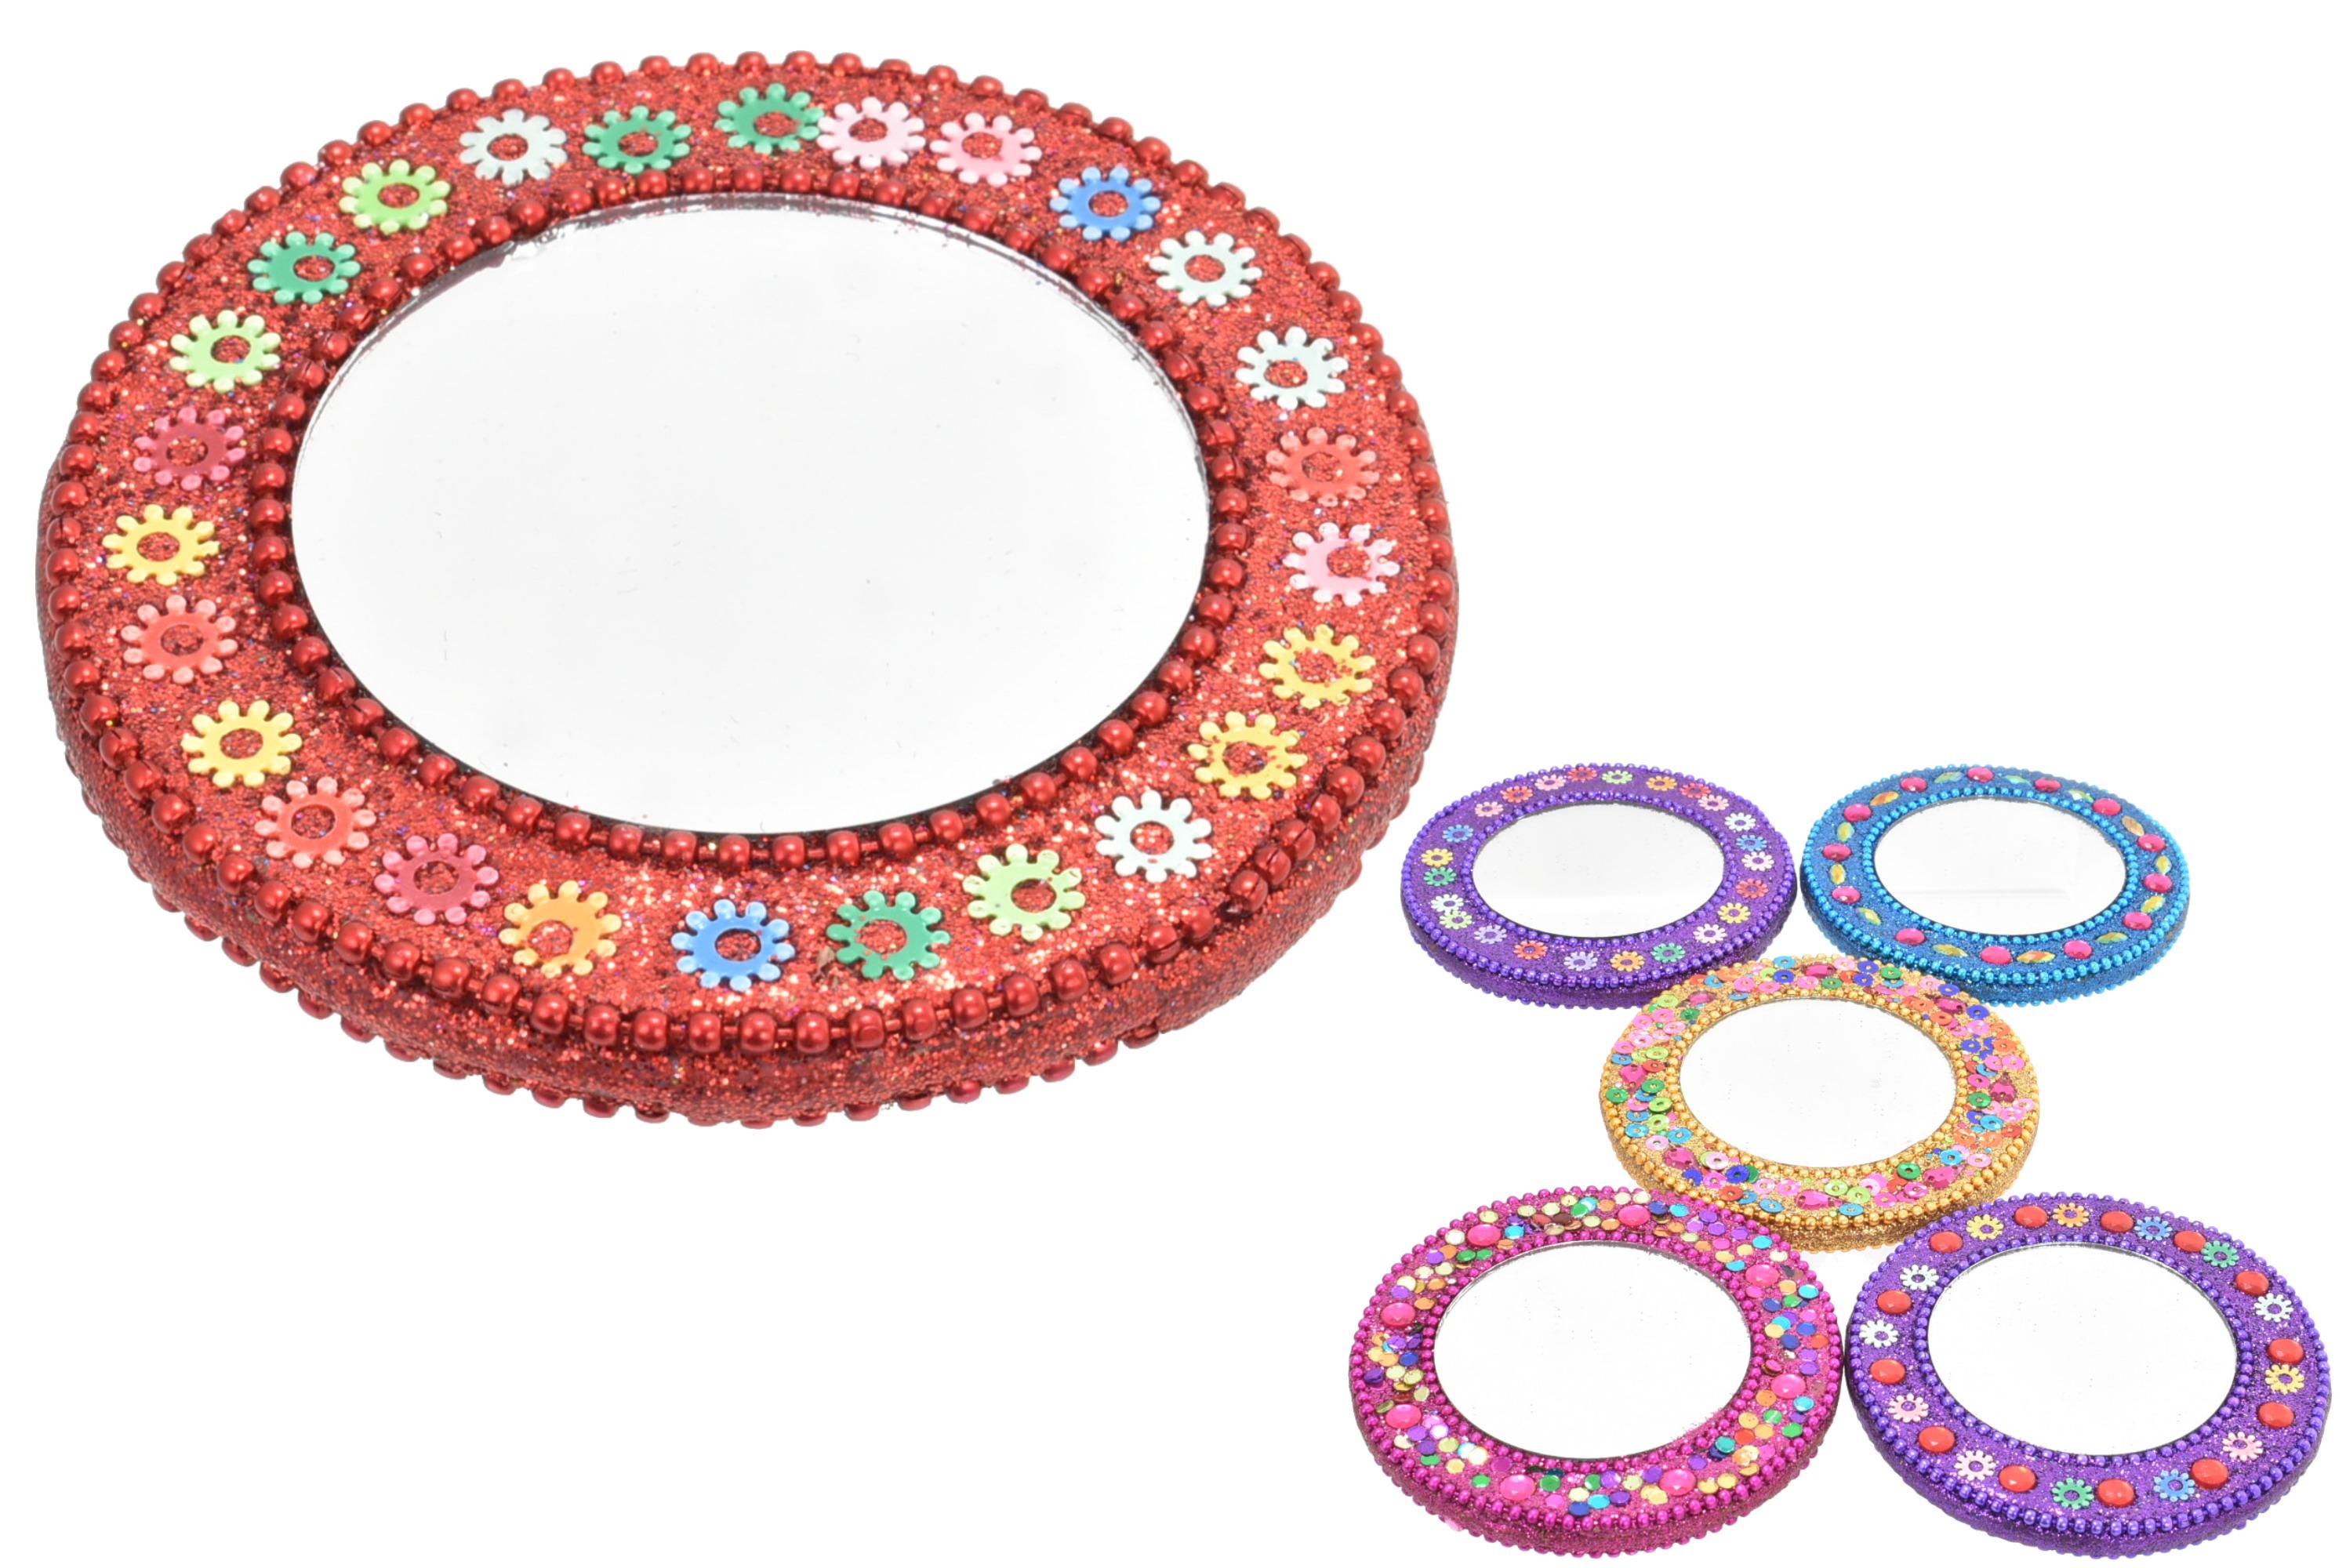 7.5cm Mirror With Glitter Decoration